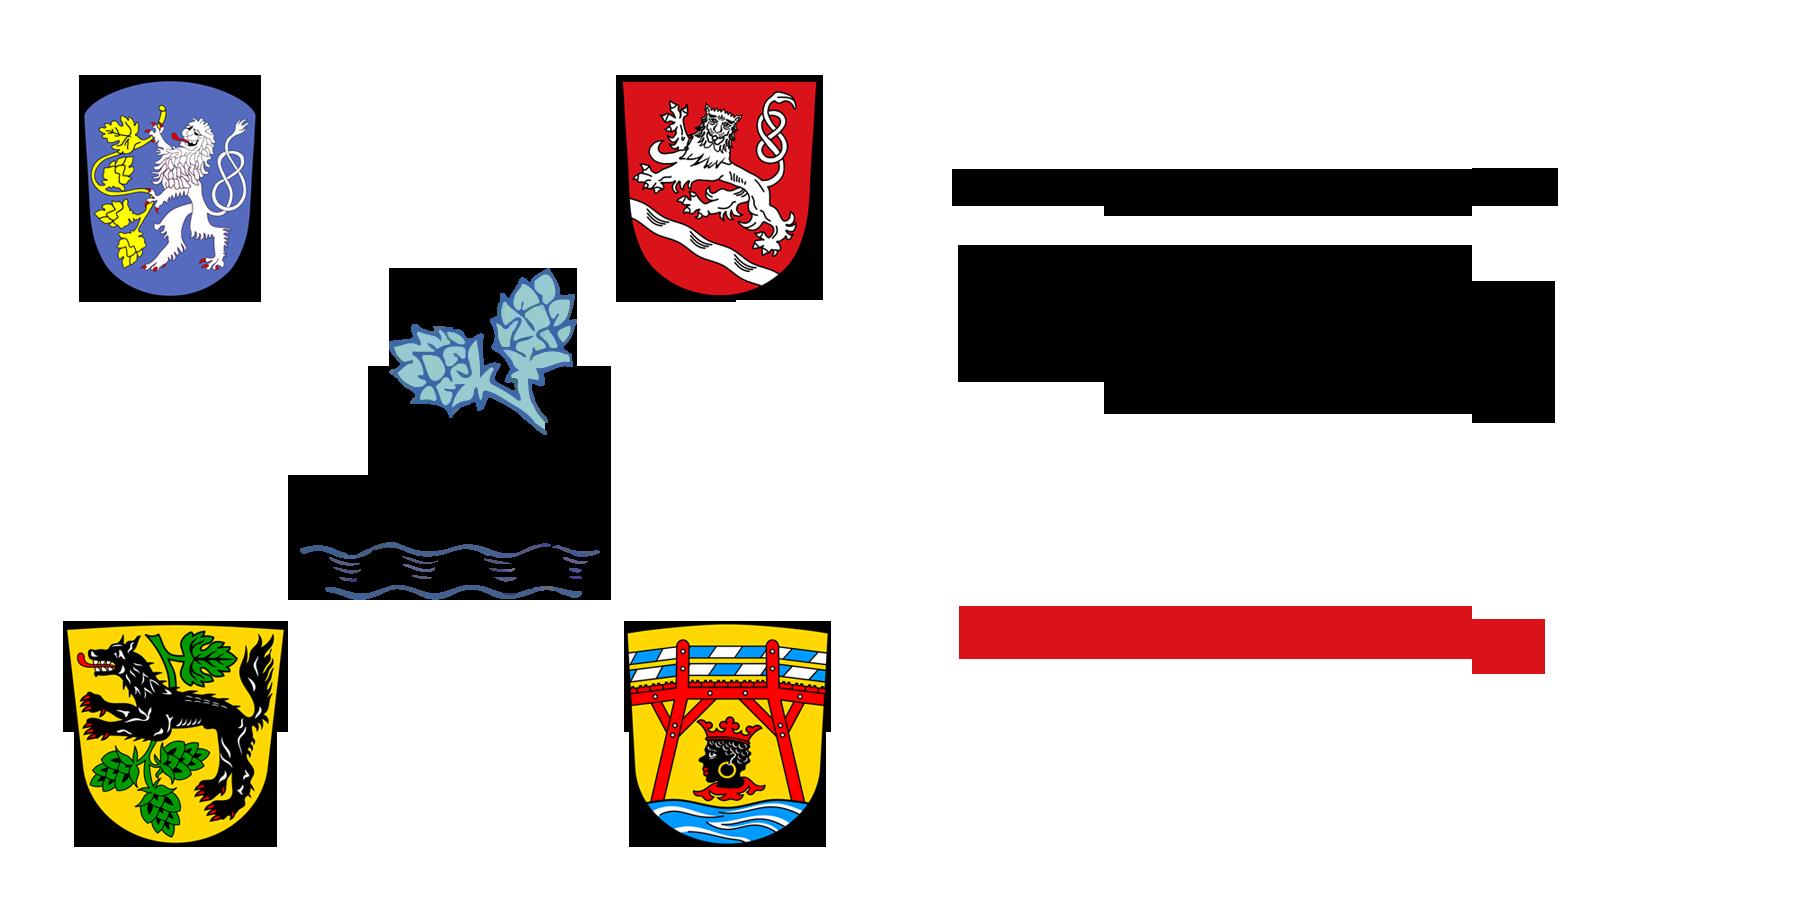 aktuelles - gemeinde haag a. d. amper